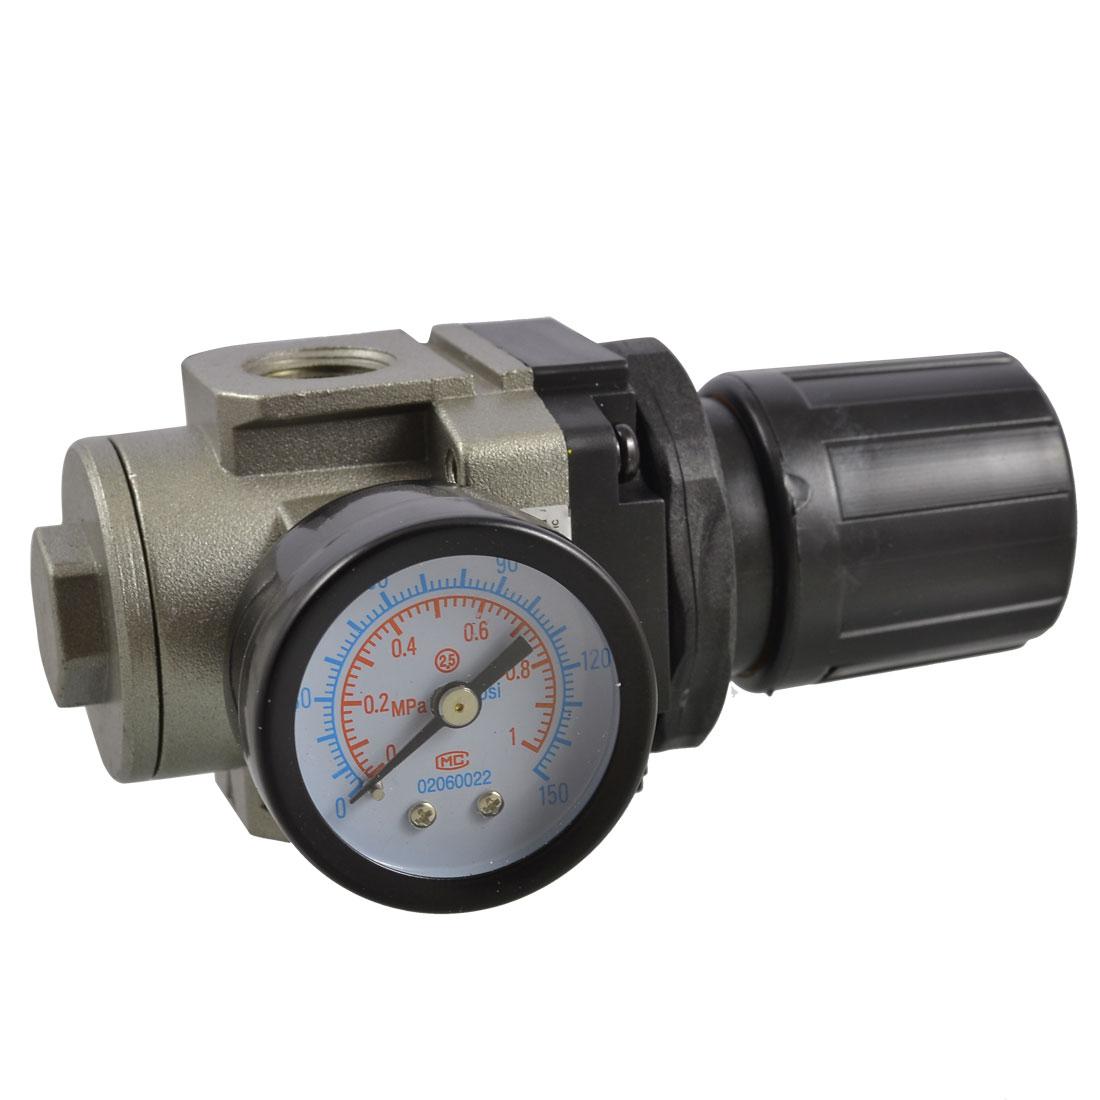 0-1 MPa Gauge Pneumatic Air Source Treatment Pressure Regulator